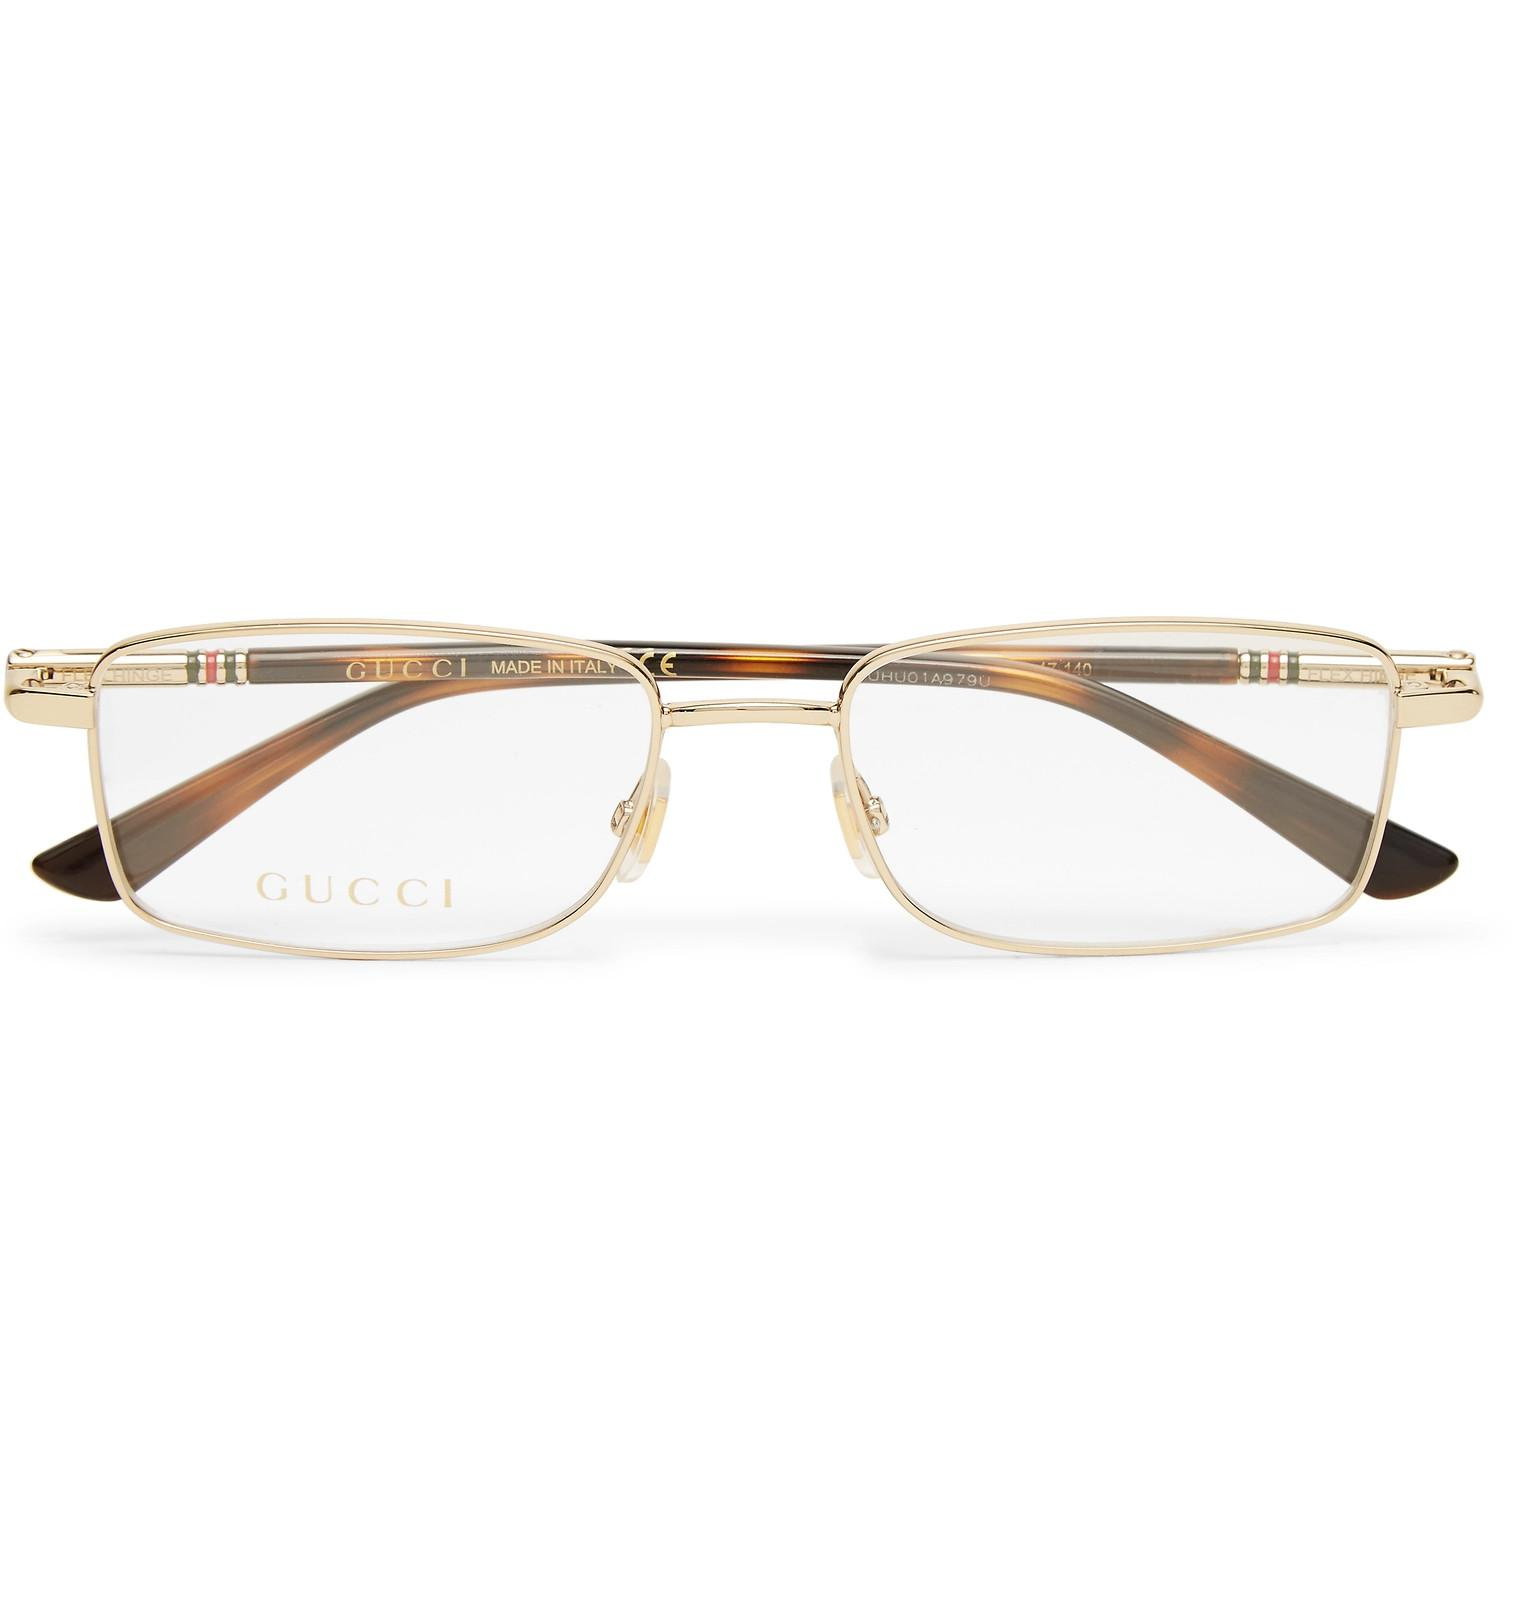 47bb040170ad1 Gucci - Metallic Square-frame Gold-tone Optical Glasses for Men - Lyst.  View fullscreen